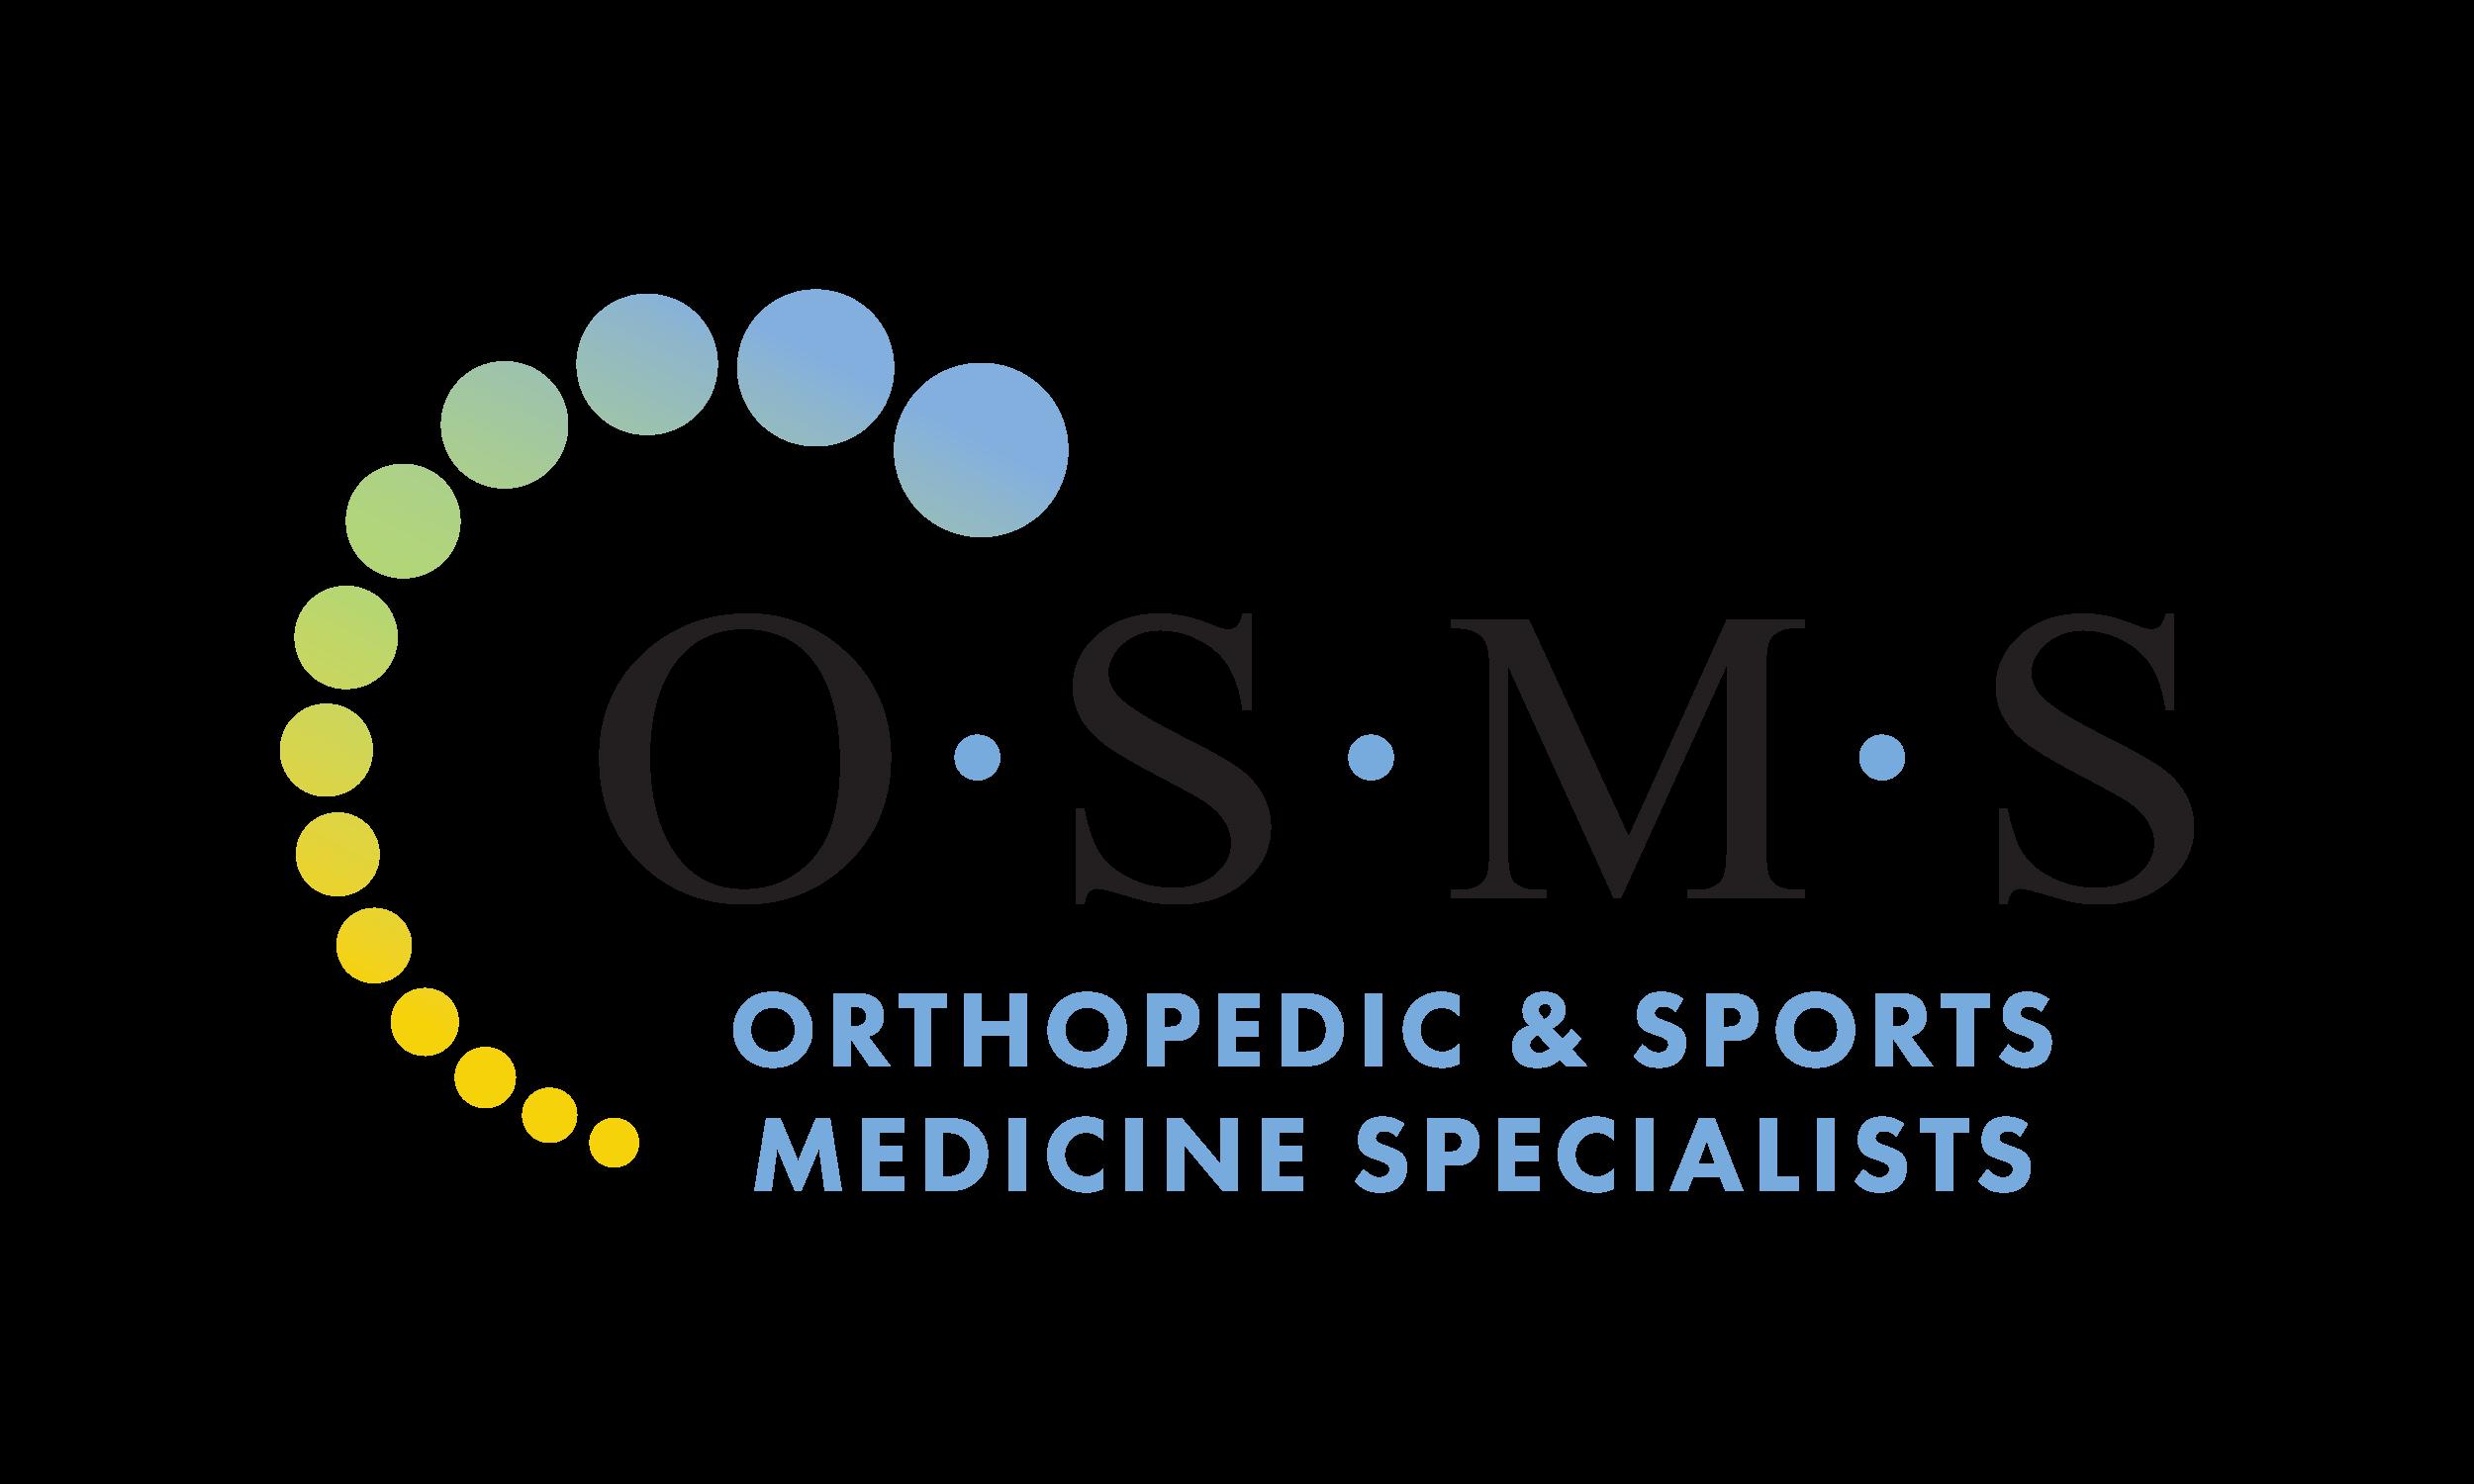 Orthopedic & Sports Medicine Specialists logo.